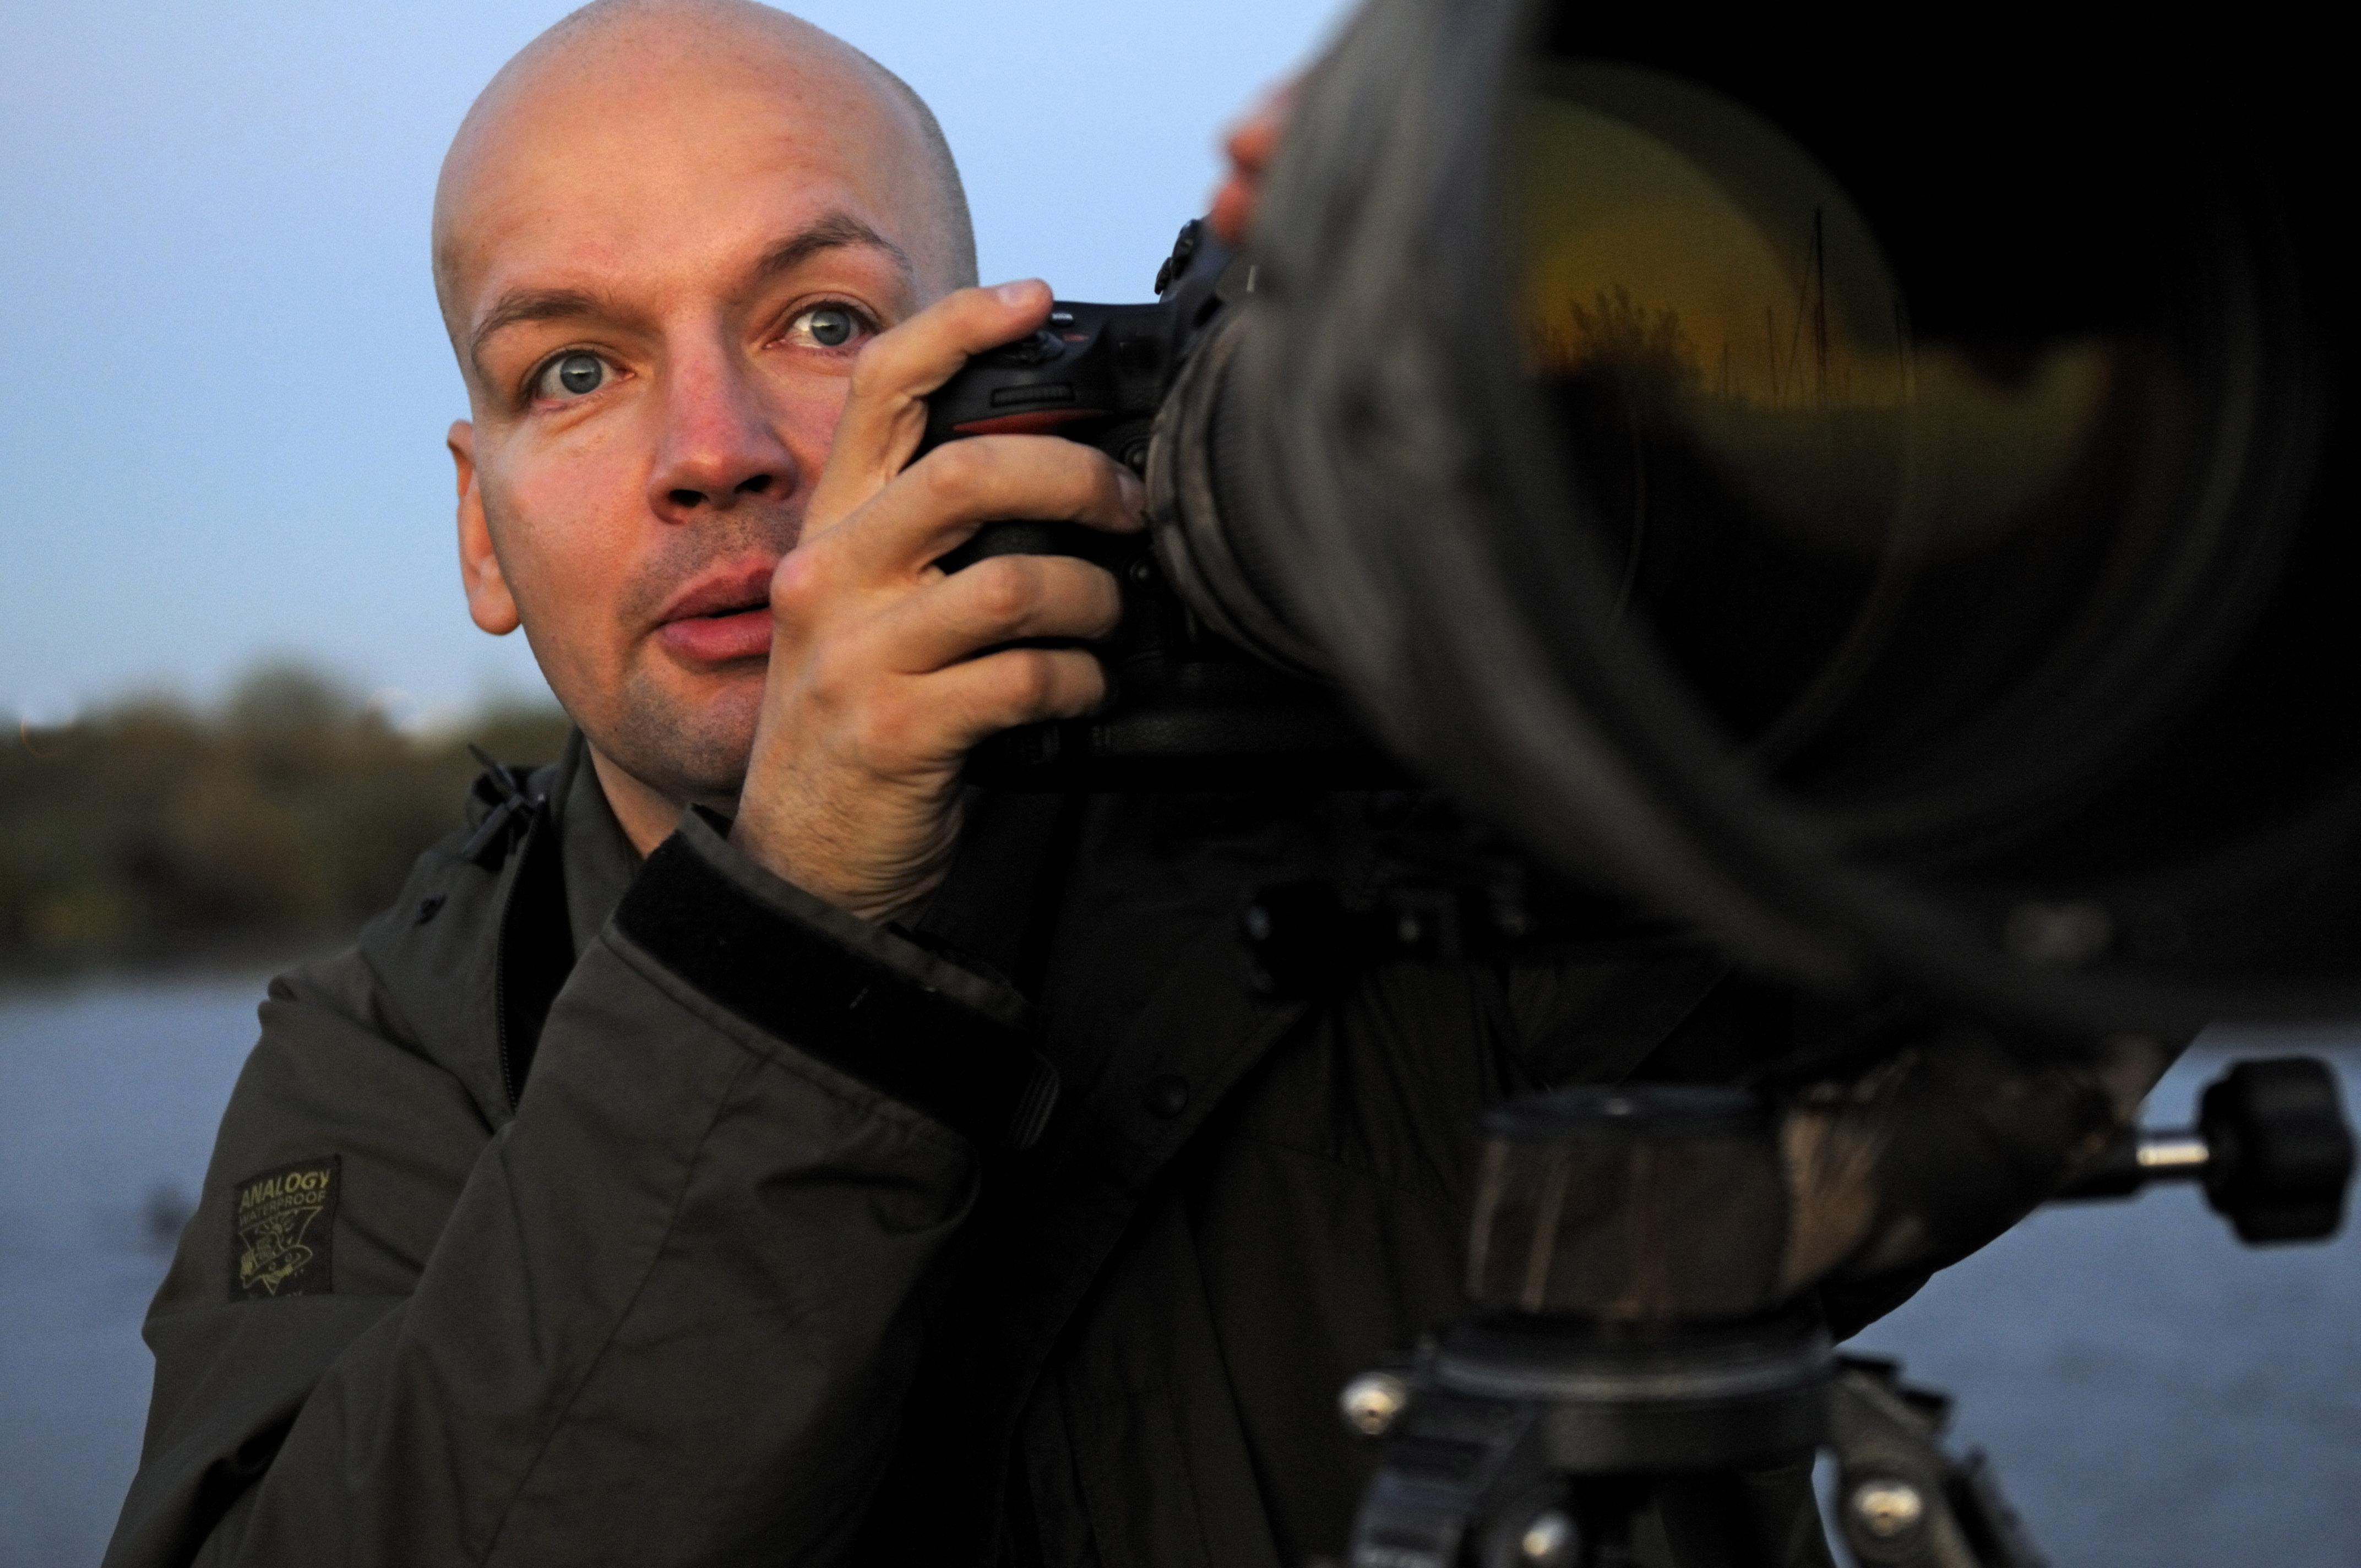 Craig Jones Wildlife Photography - Craig with his camera